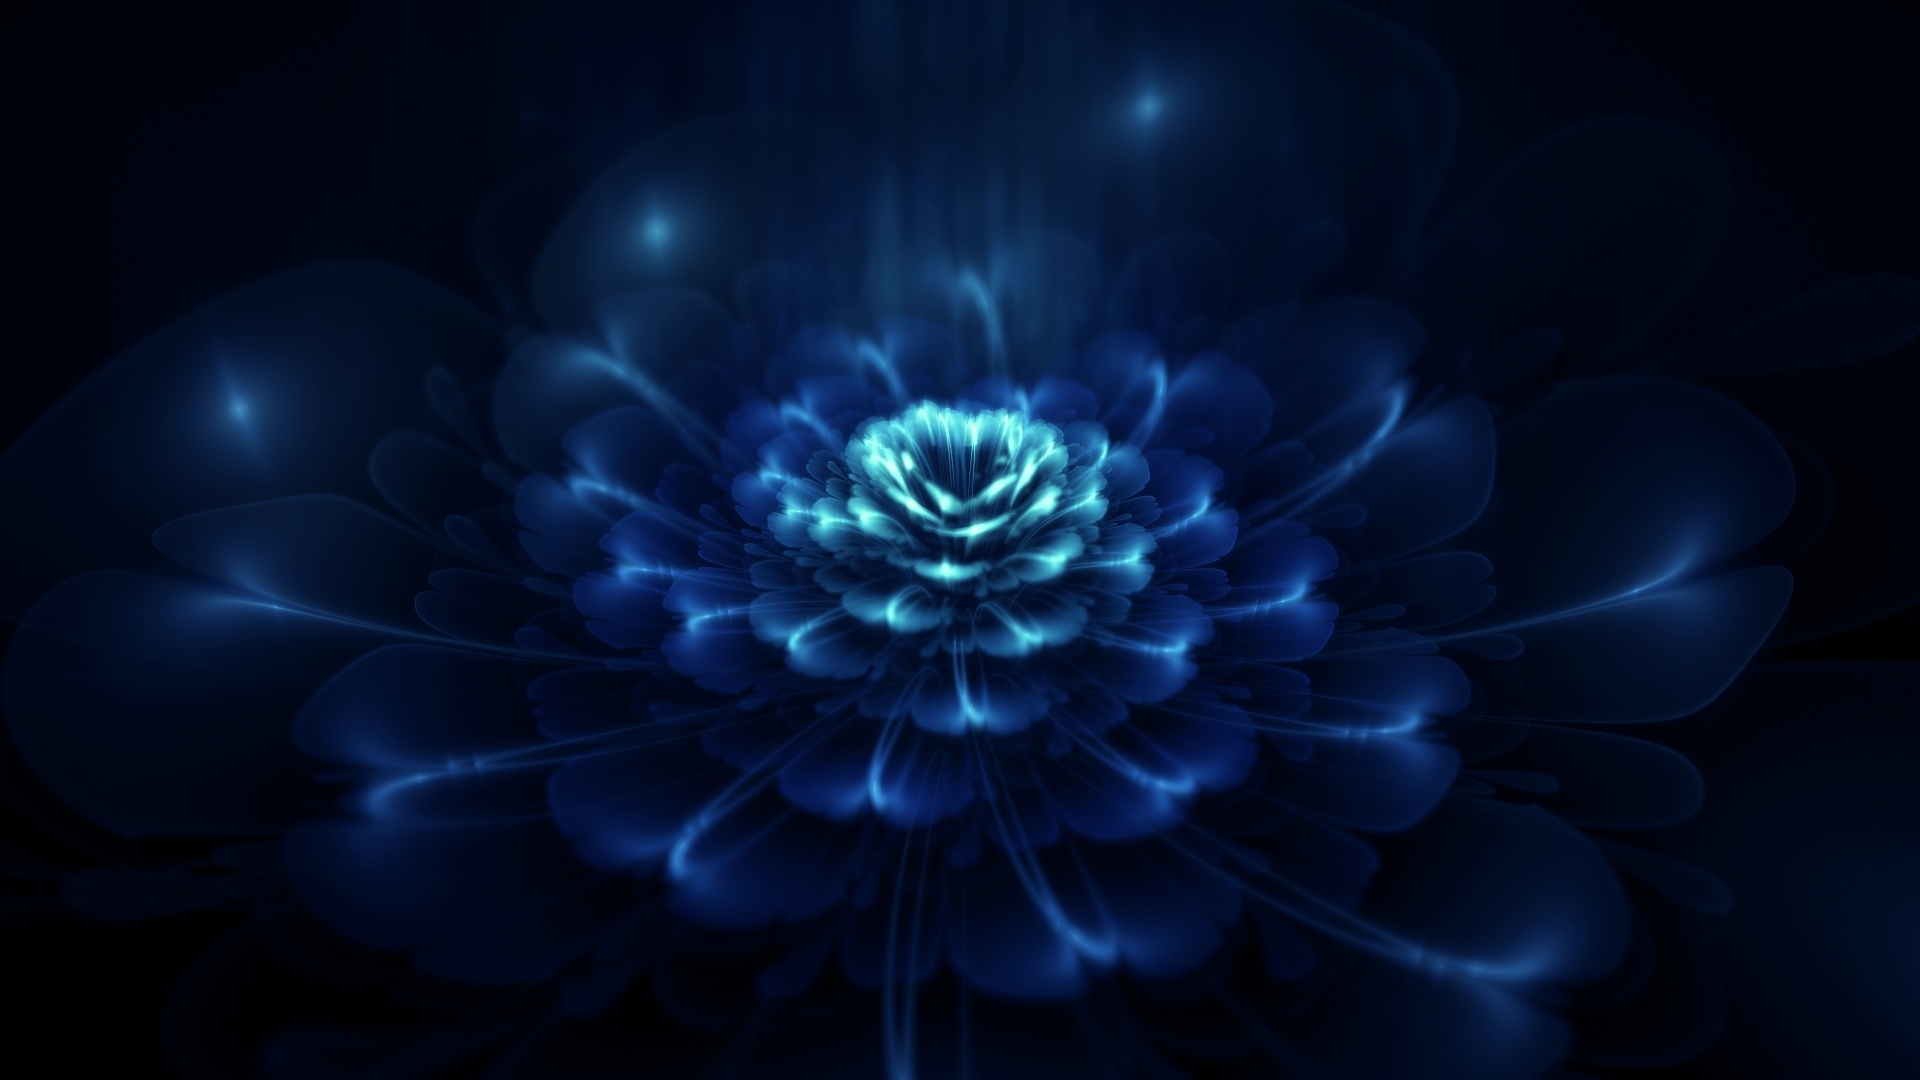 dark blue flowers wallpaper - 1395249